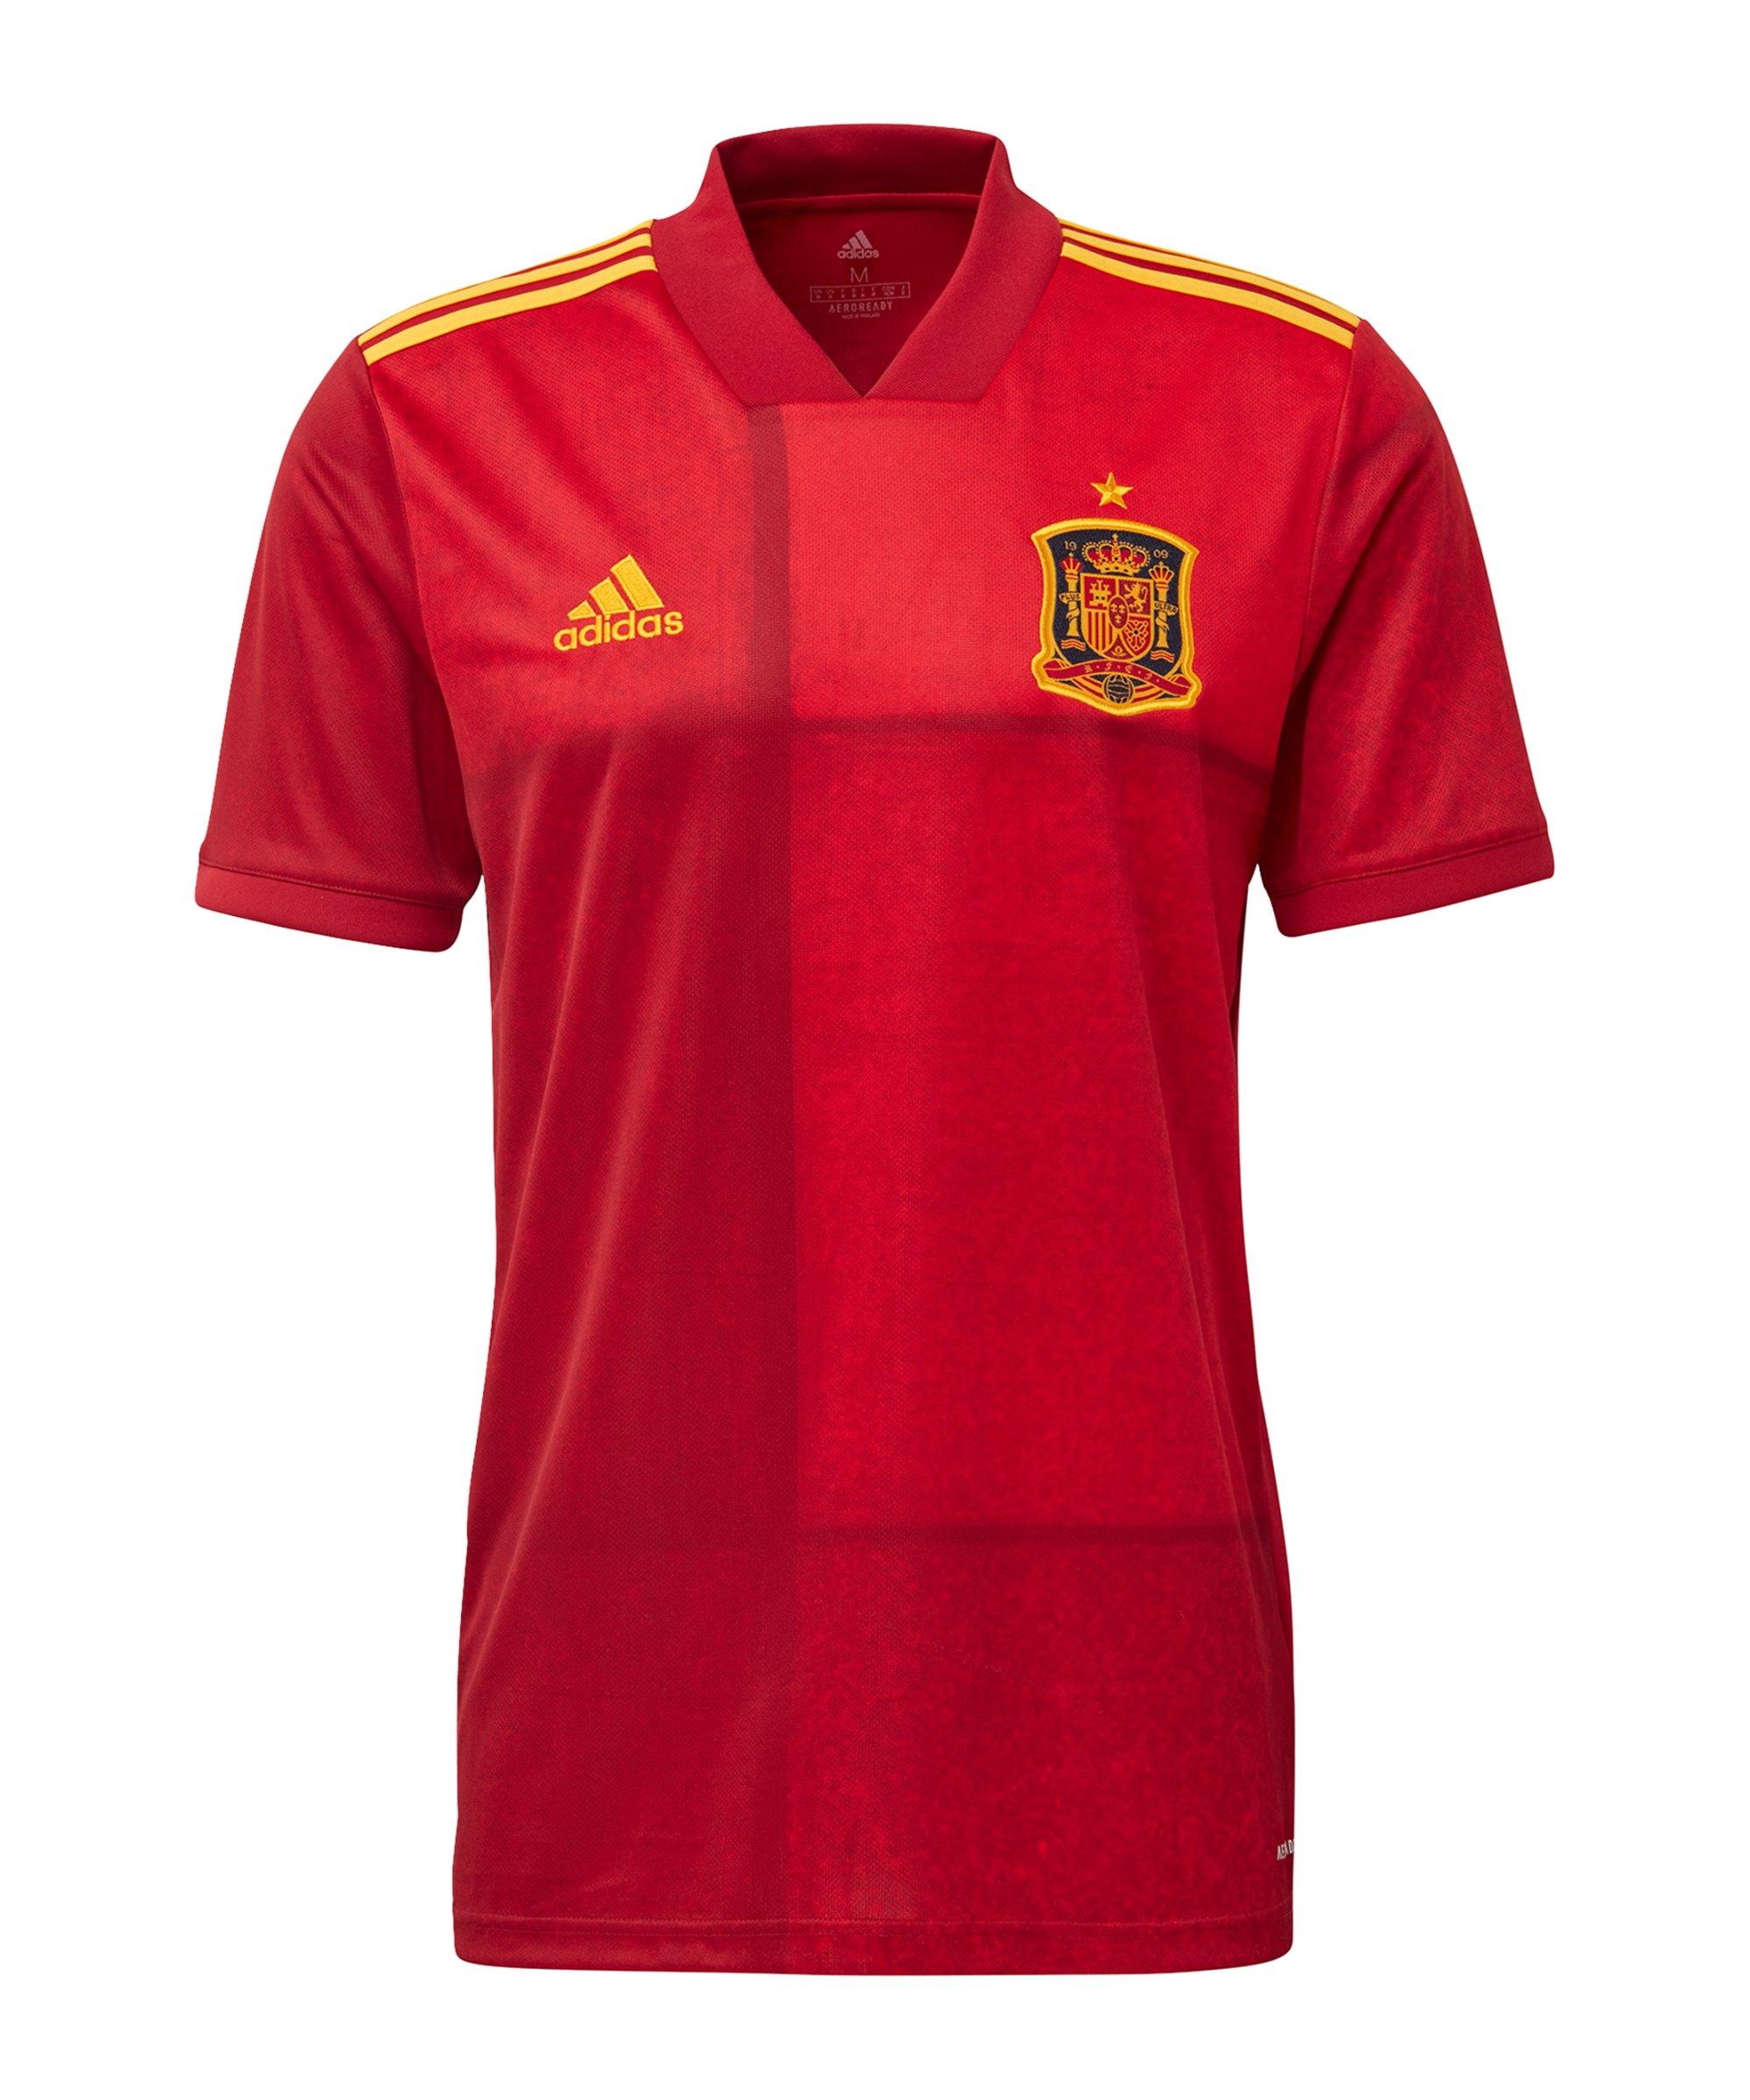 adidas Spanien Trikot Home EM 2020 Rot - rot